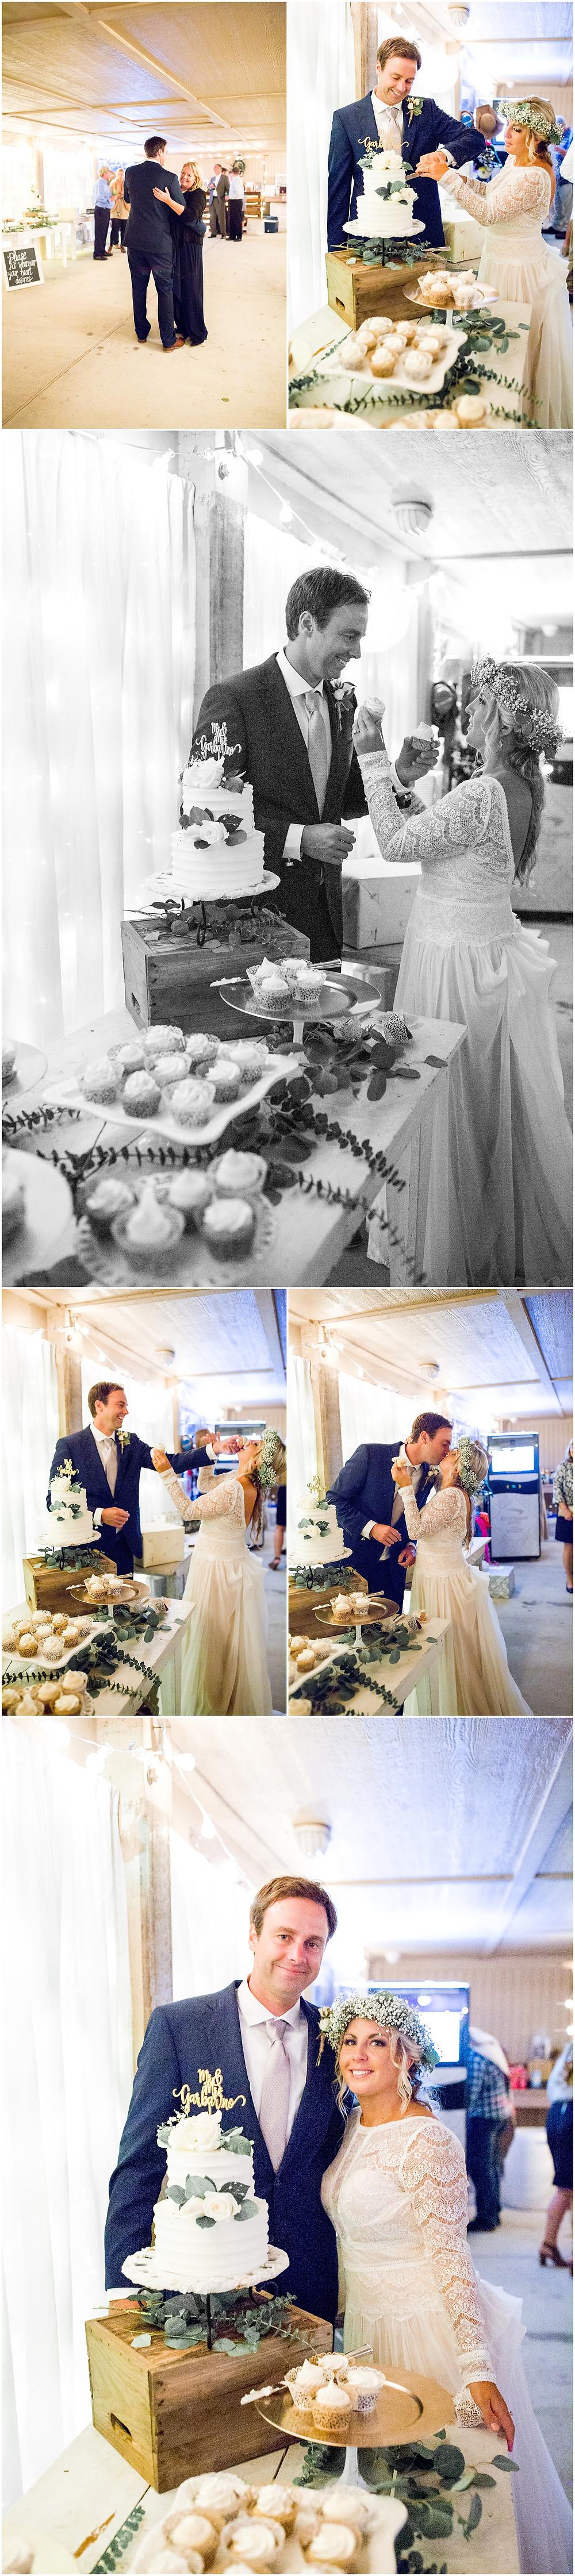 Bride and Groom cut the cake, North Carolina Wedding